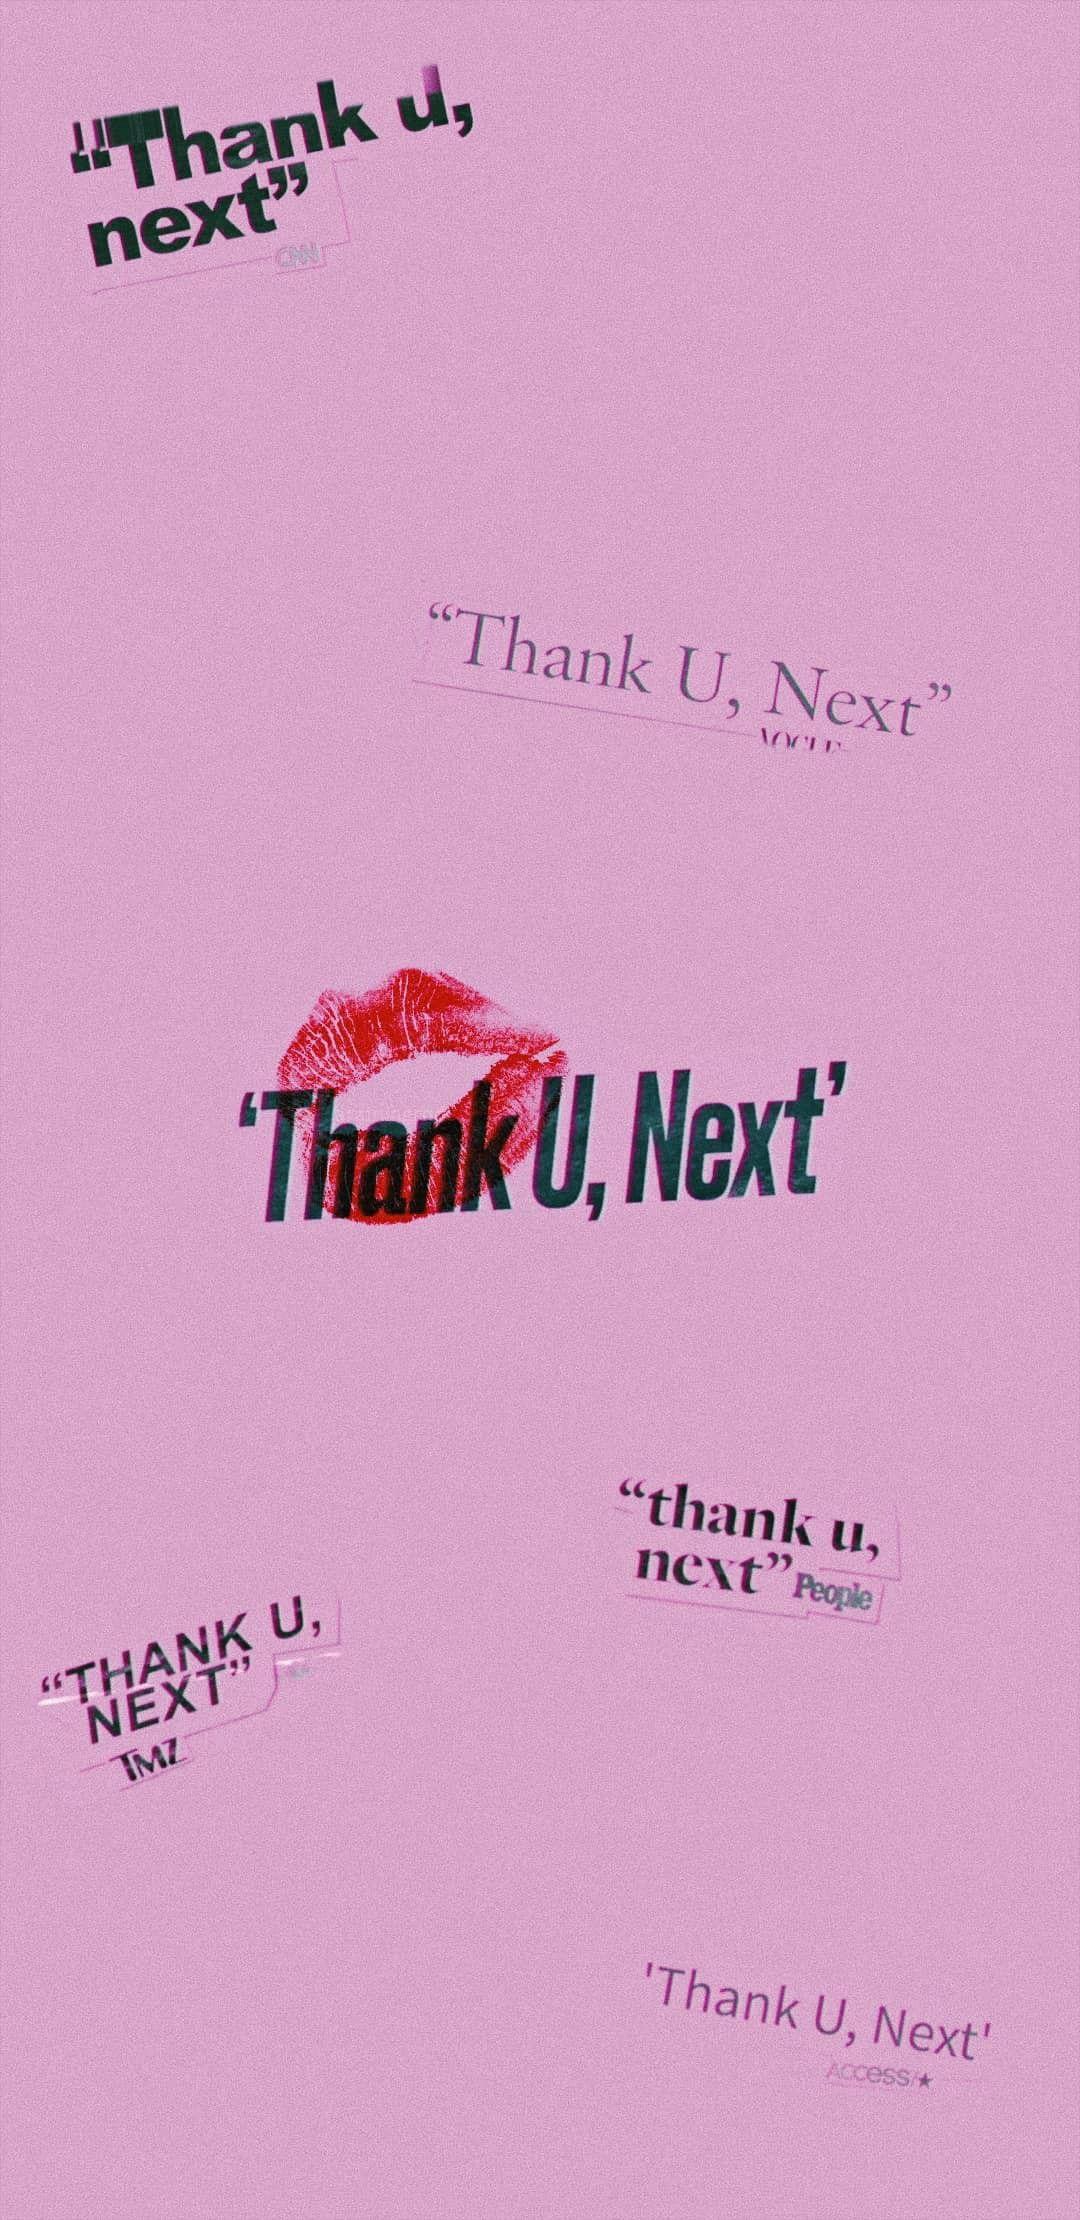 Pin de Sweet Princess en Fondos de pantalla | Ariana grande wallpaper, Next wallpaper y Wallpaper